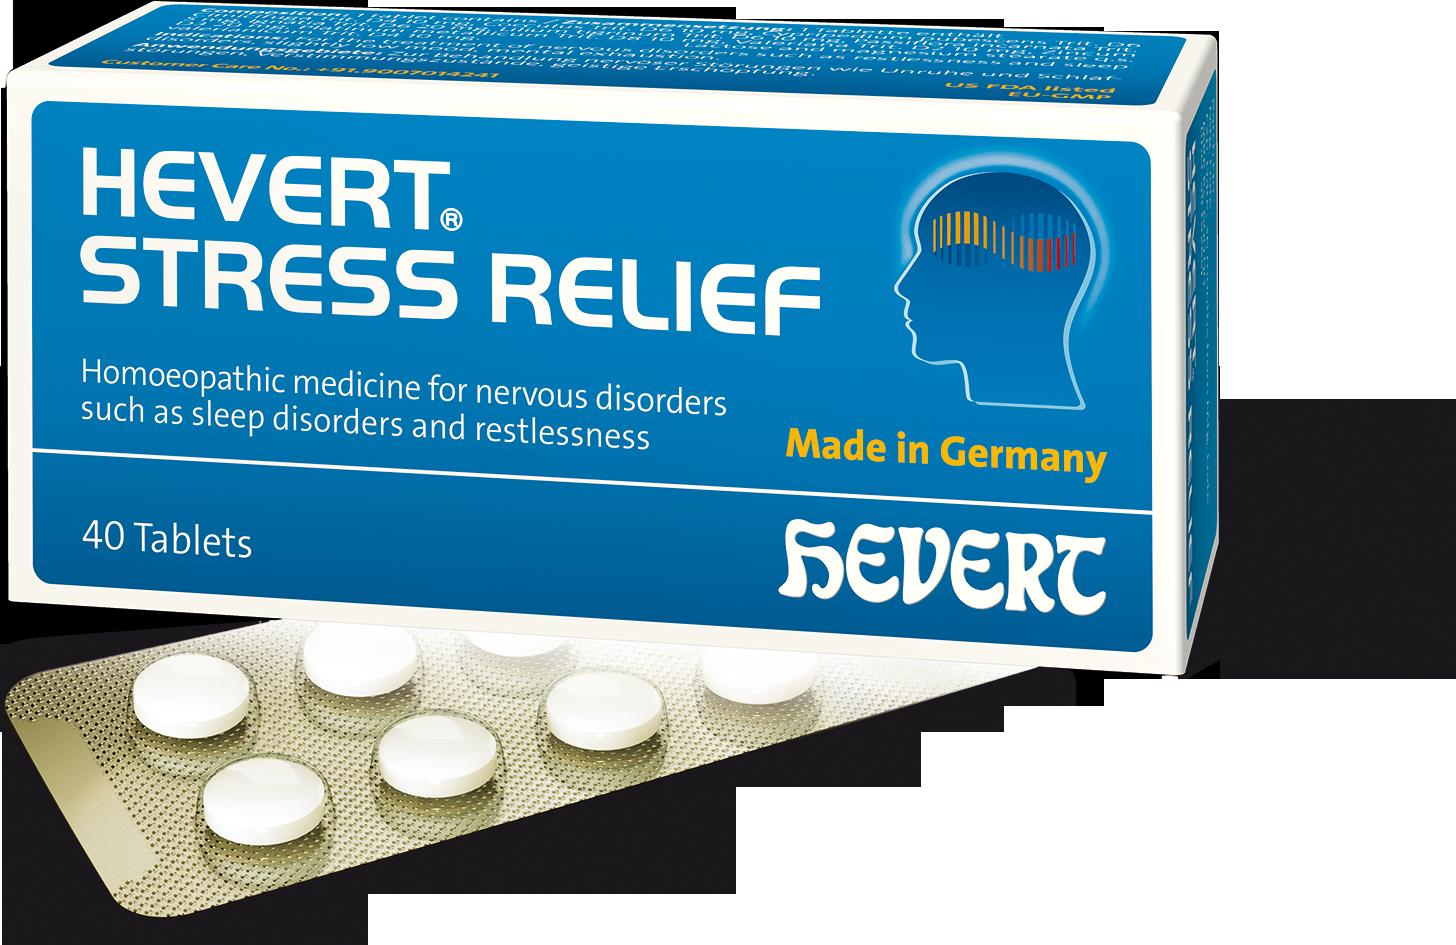 Hevert-Stress-Relief